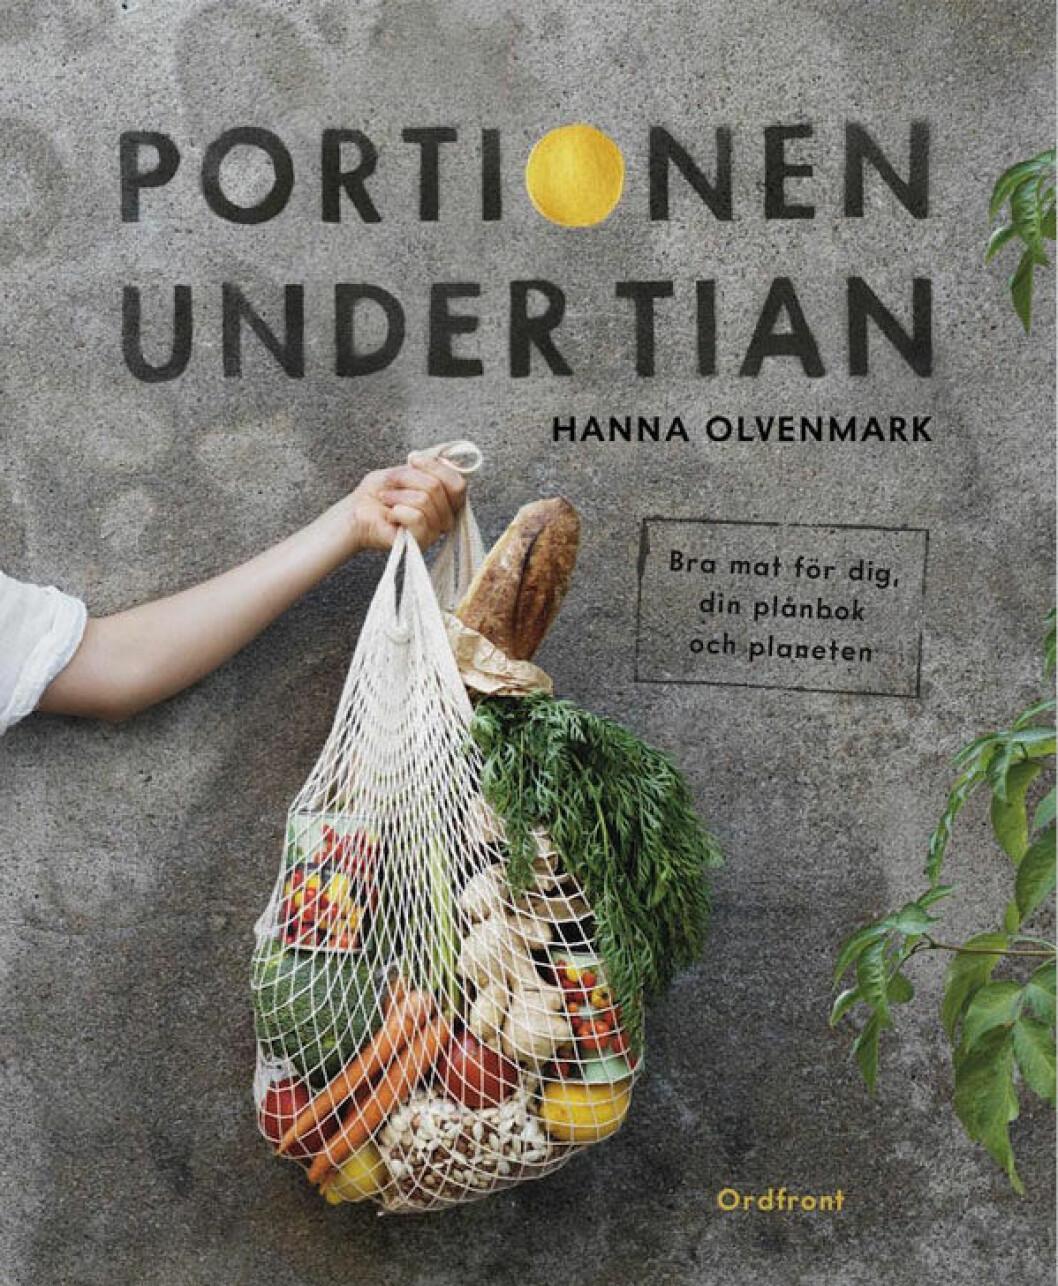 Kokboken Portionen under tian av Hanna Olvenmark.